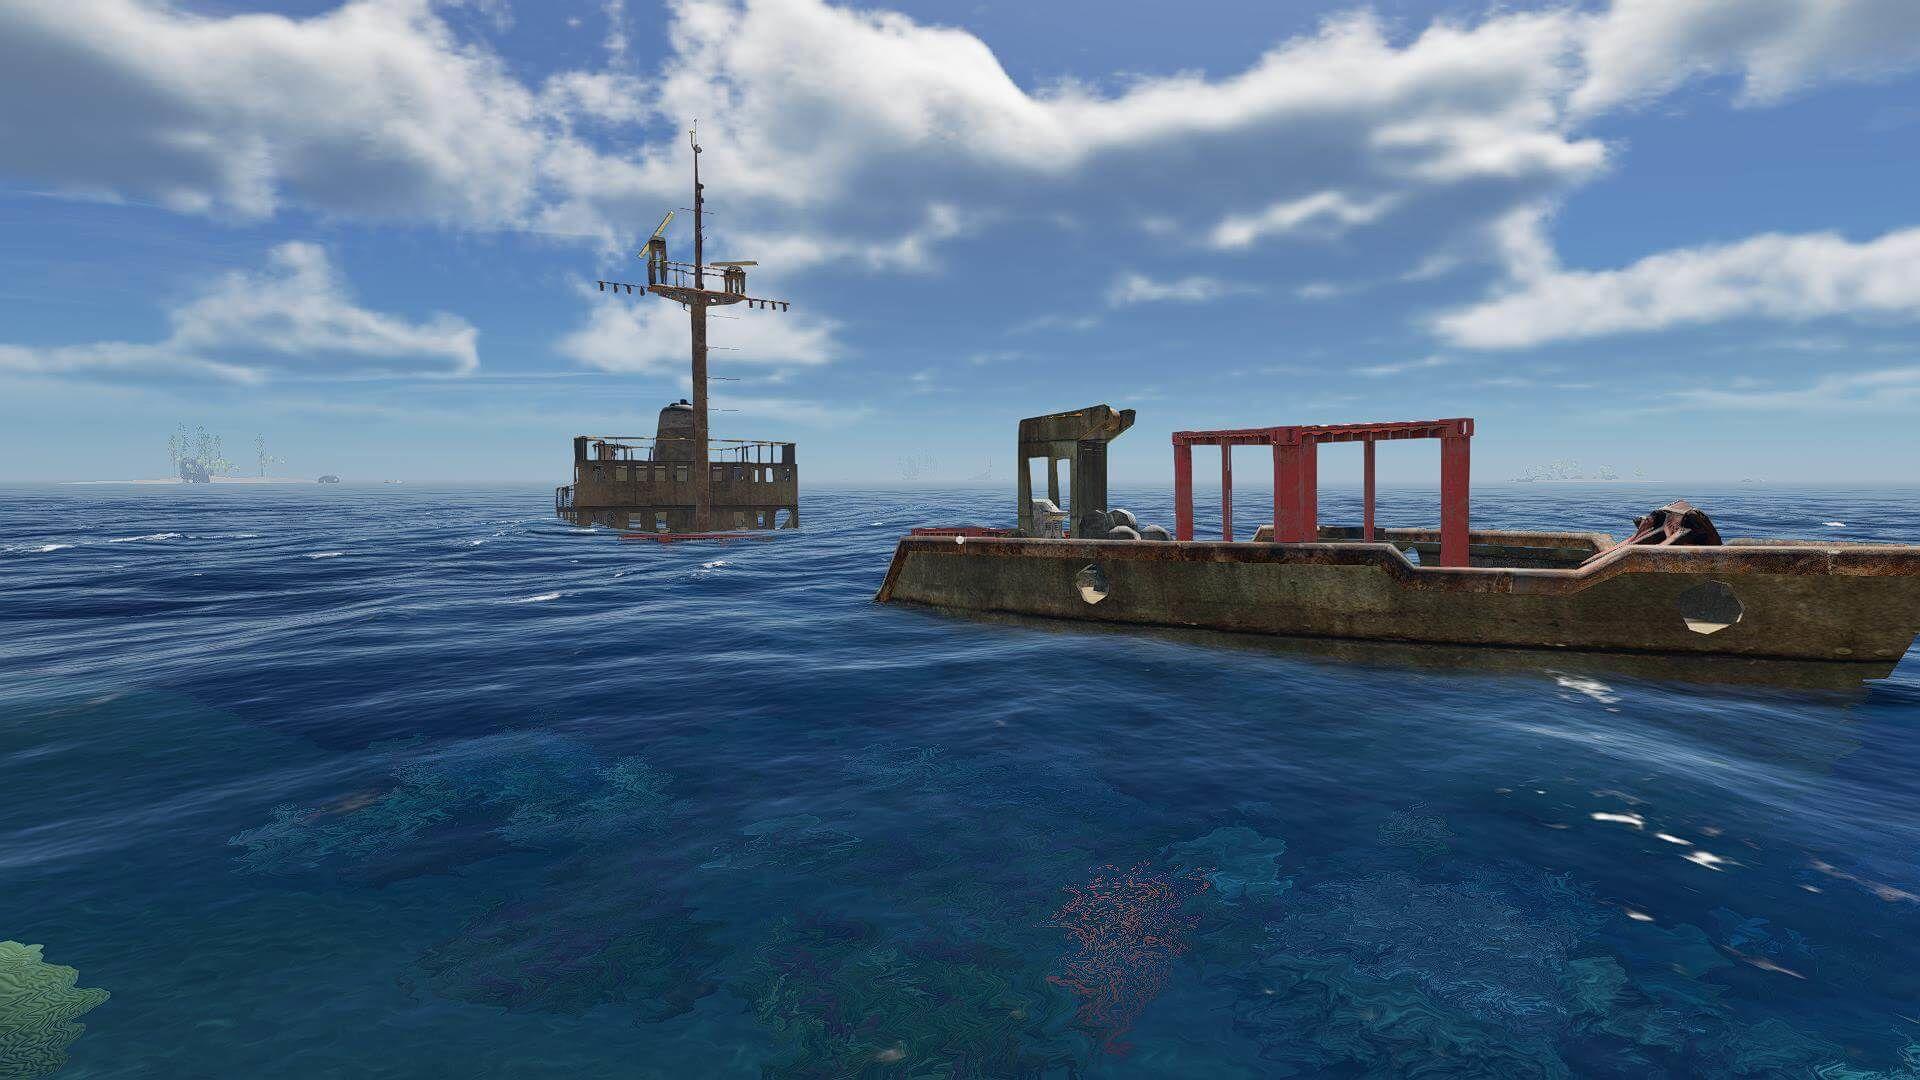 Stranded Deep - gesunkenes Schiff